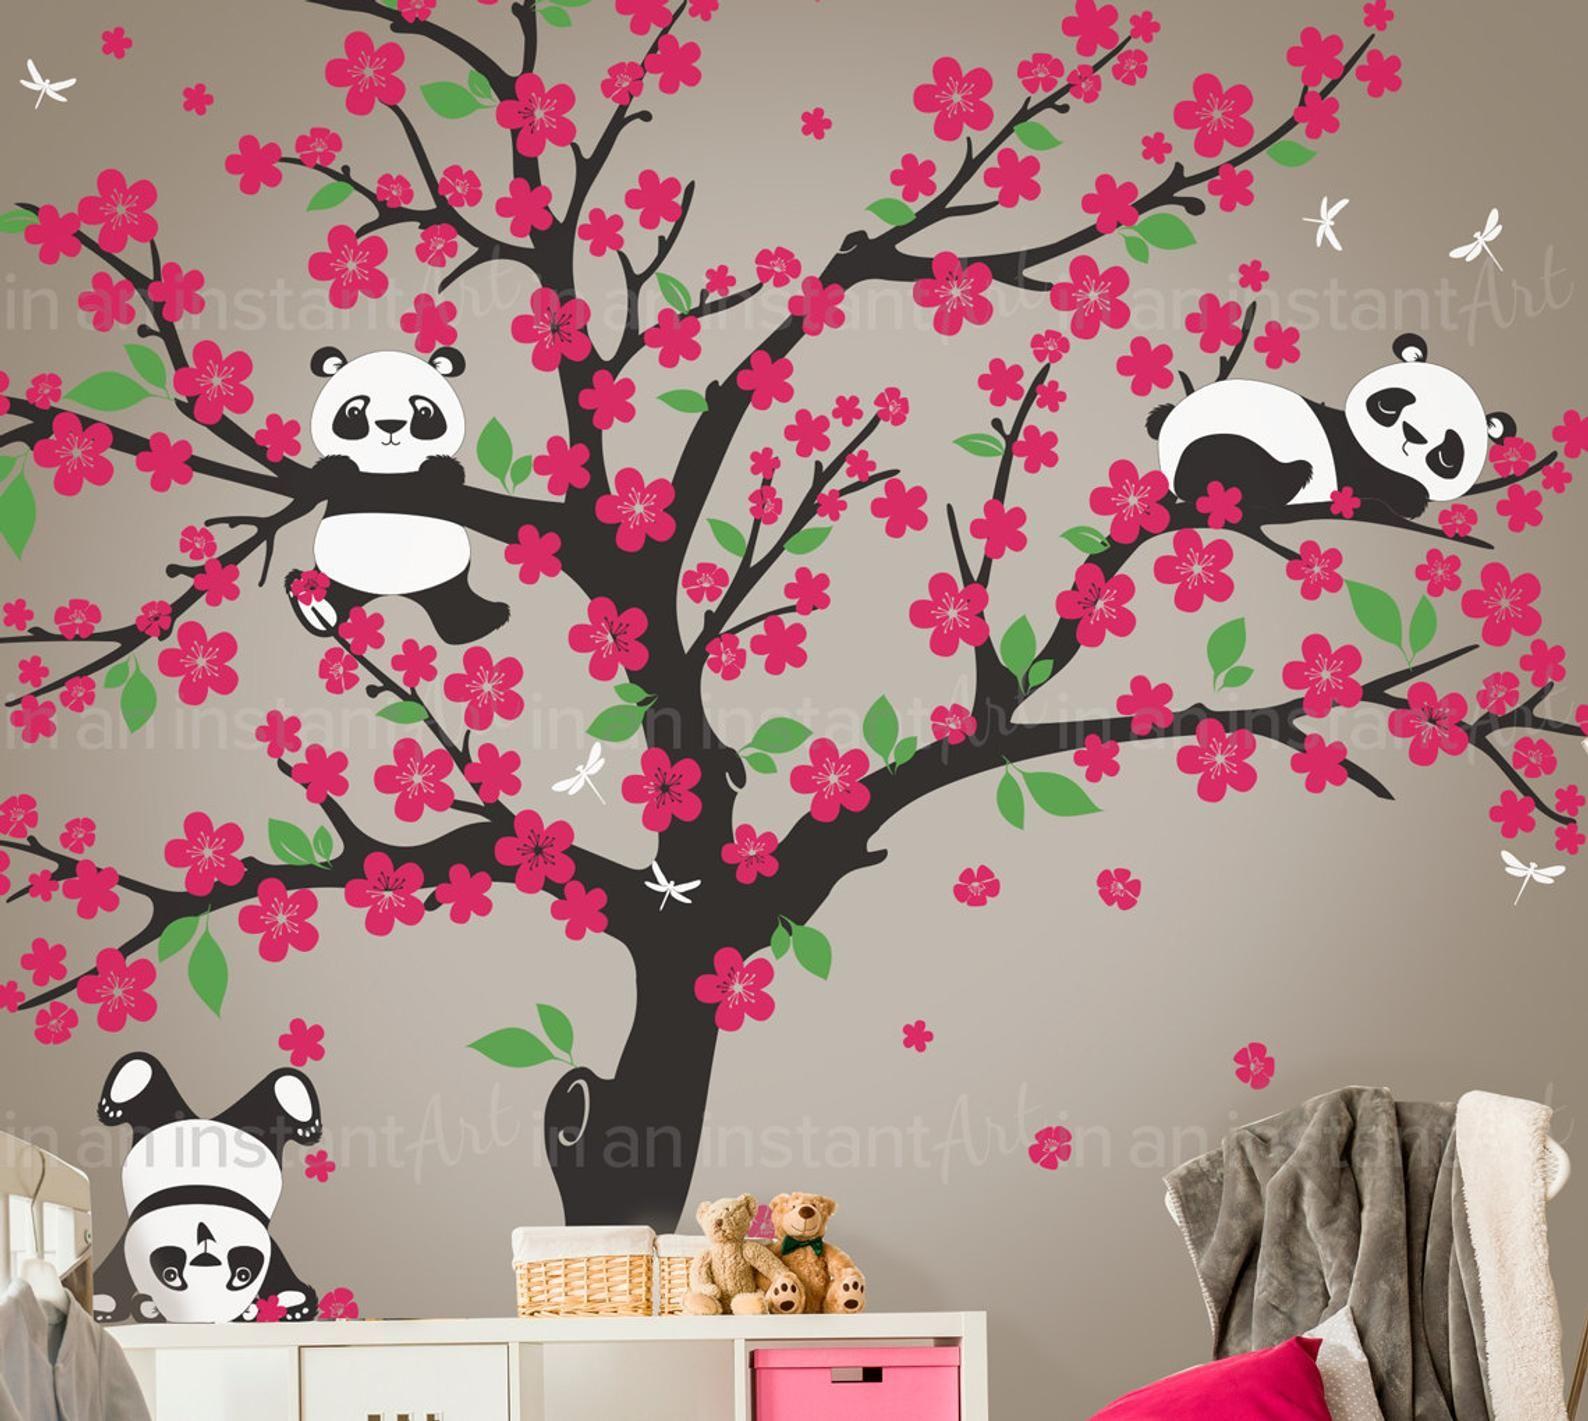 Cherry Blossom Panda Wall Decal Botanical Panda Wall Sticker Etsy Tree Wall Decal Wall Decals Custom Nursery